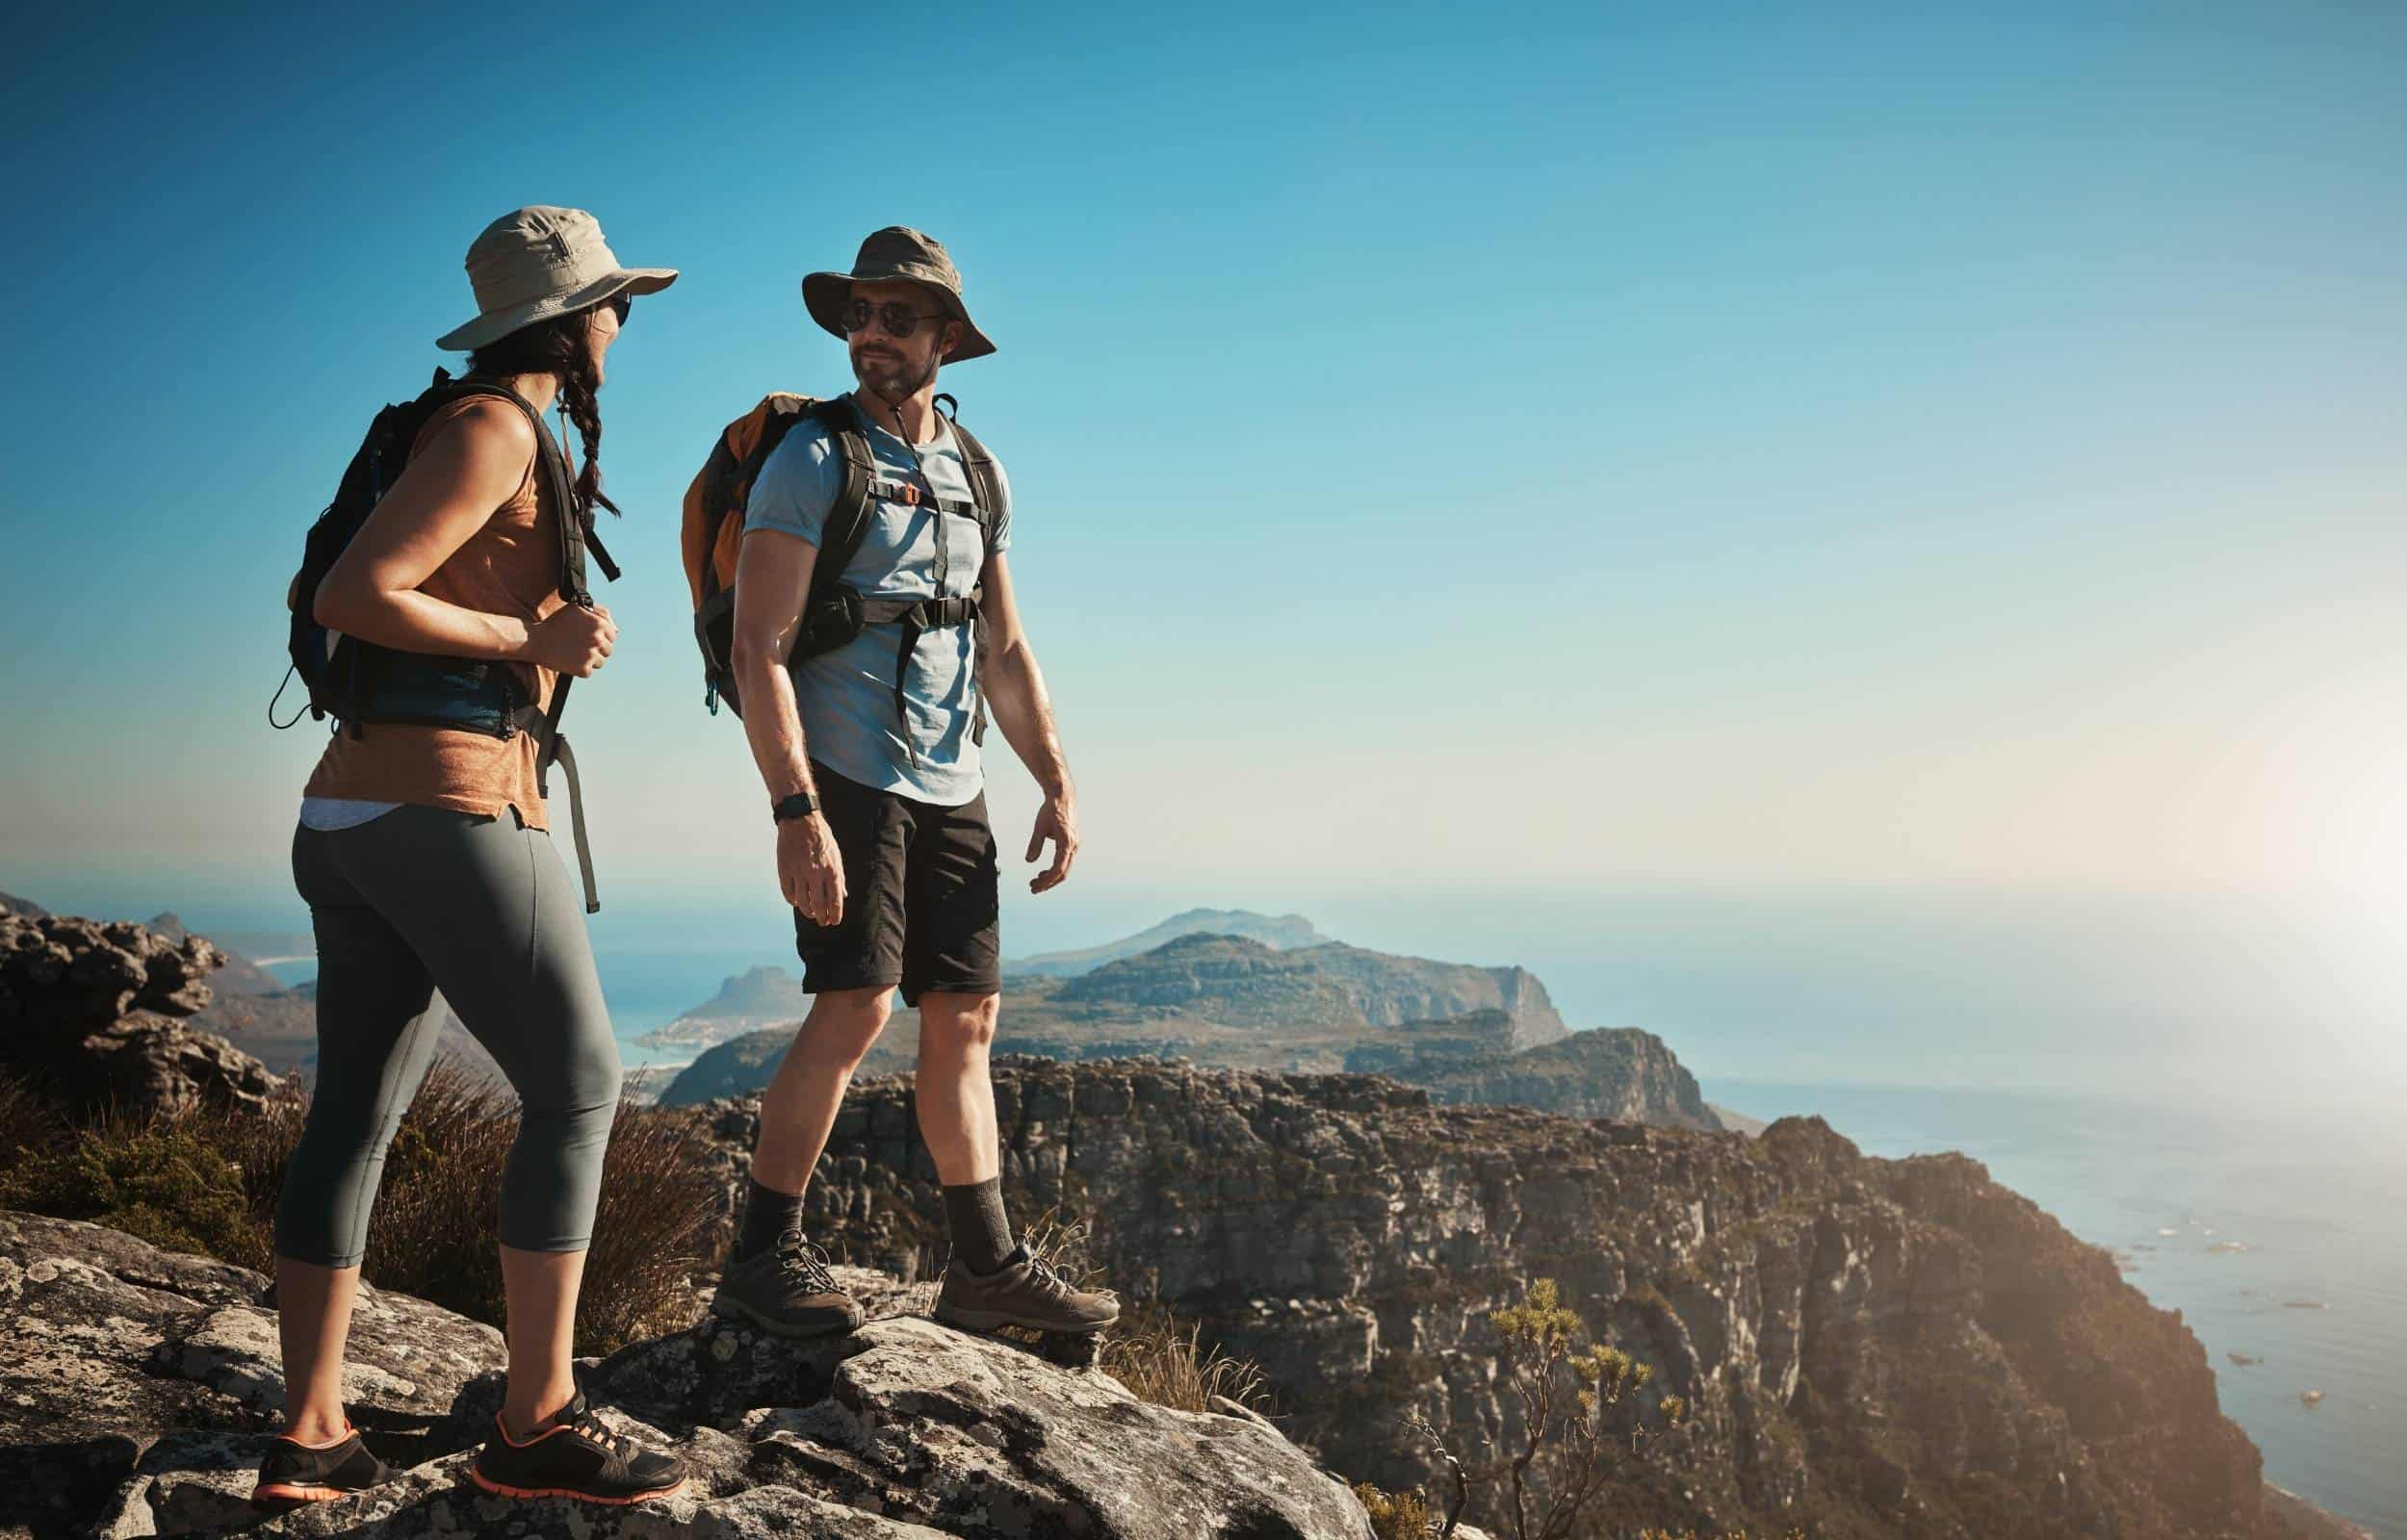 day hike couple mountain